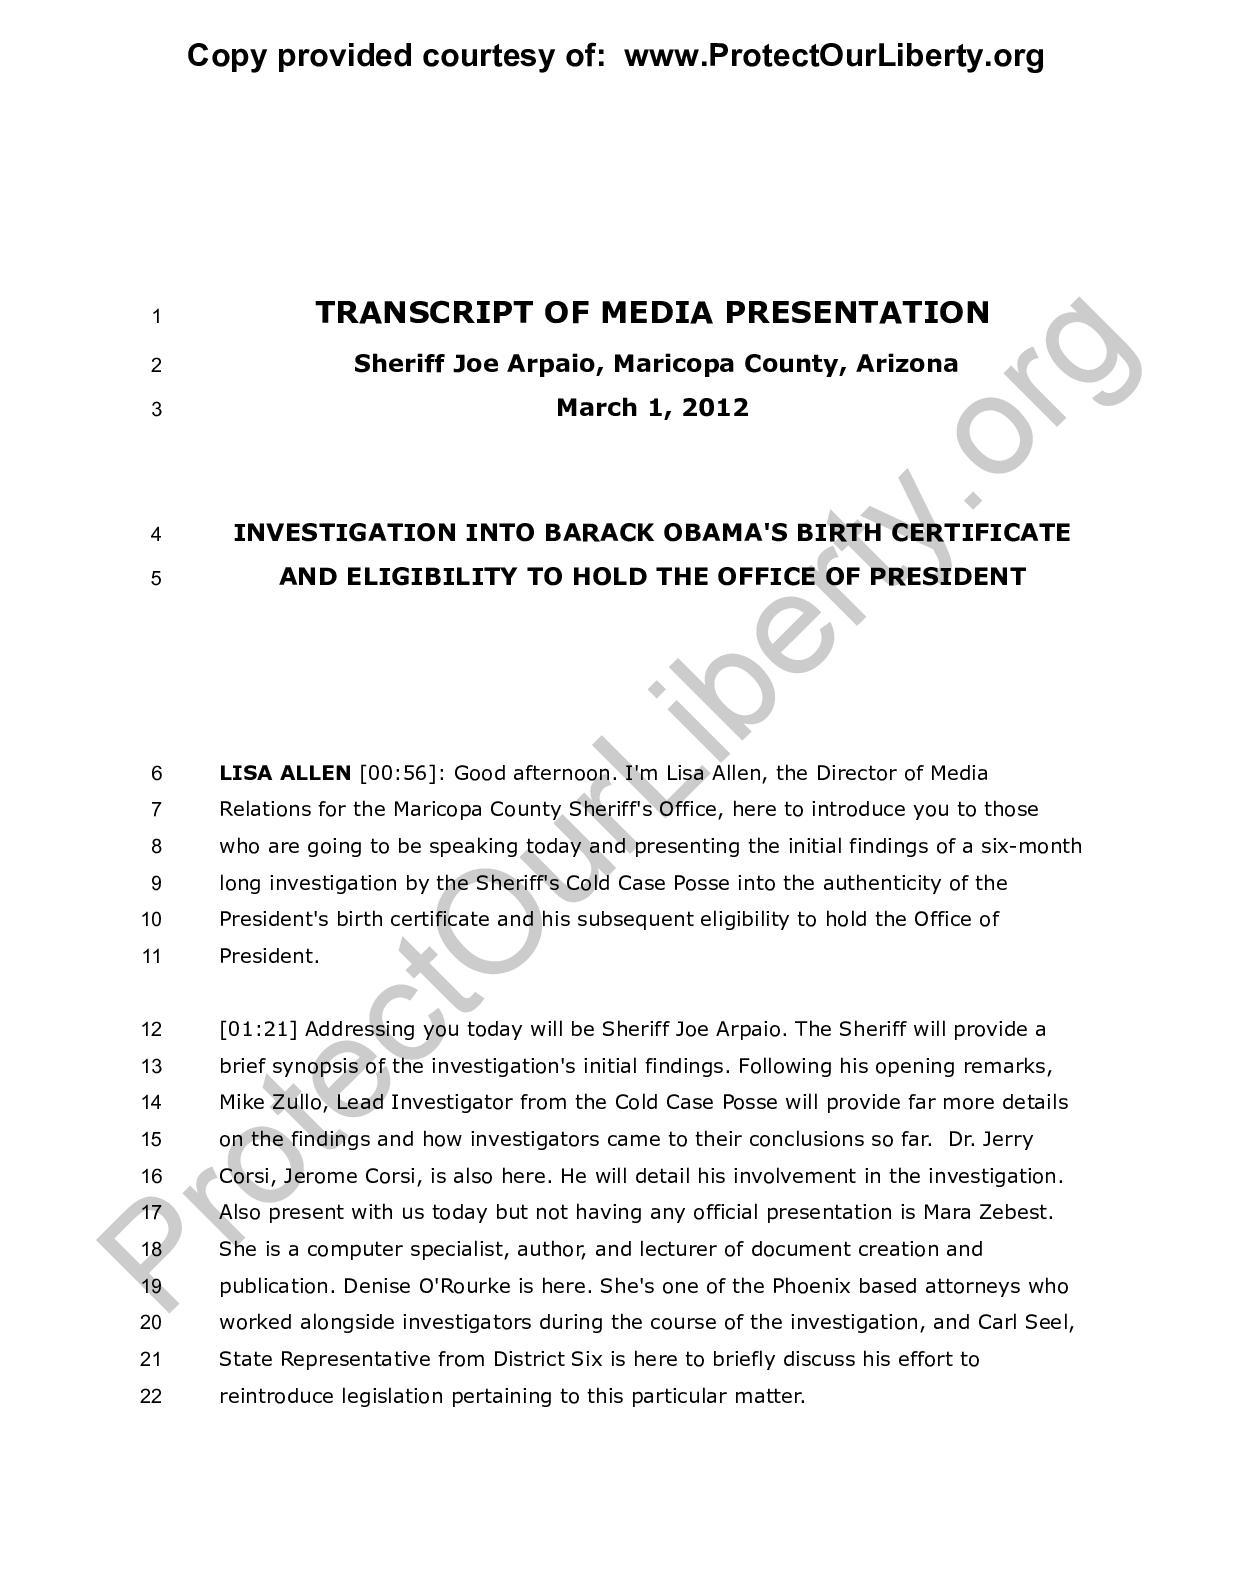 Calamo Transcript Of Media Presentation Sheriff Arpaio